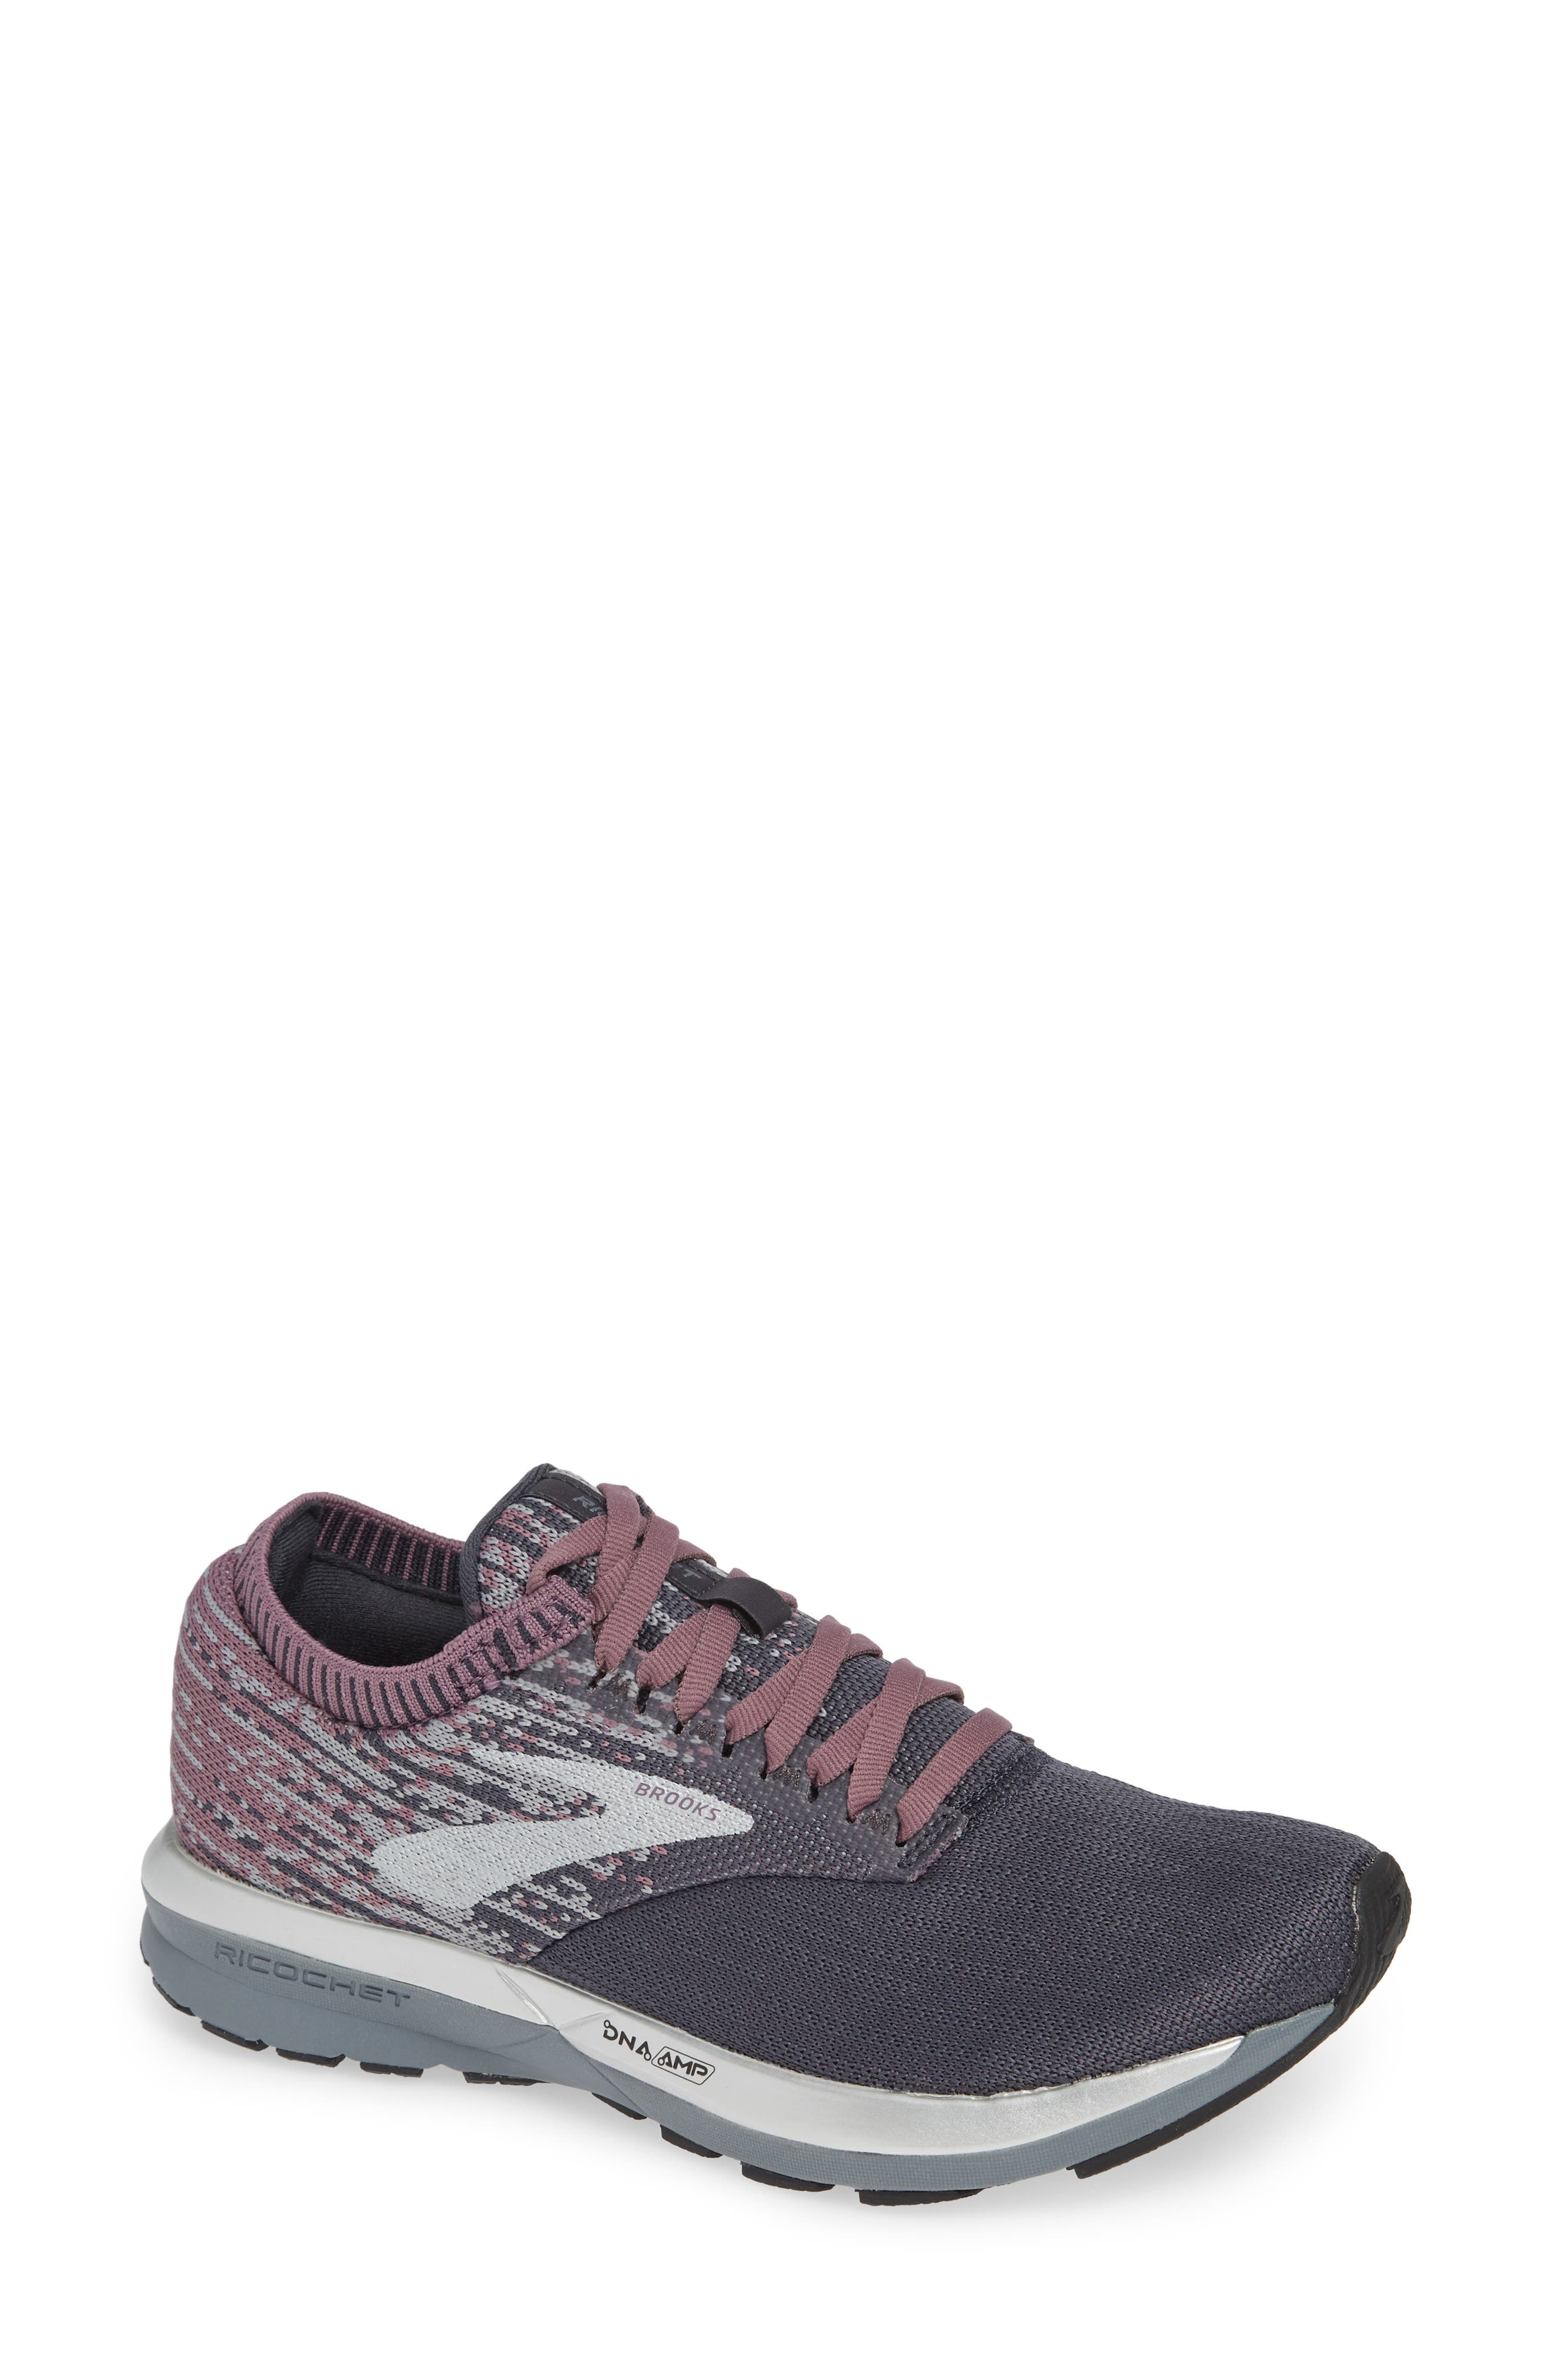 Brooks Ricochet Running Shoe, Grey